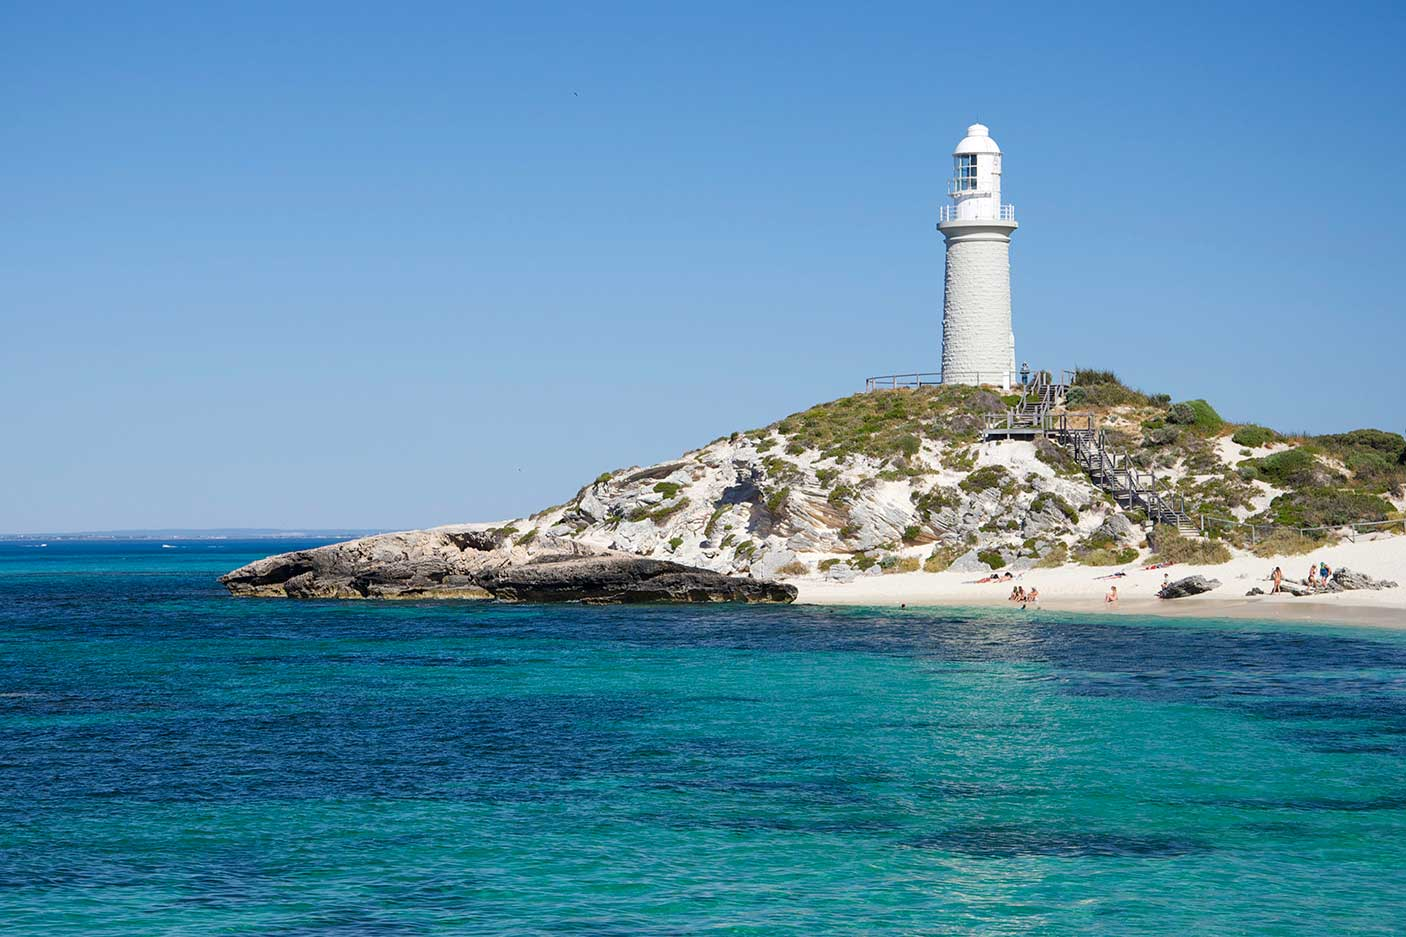 The lighthouse on Rottnest Island, Western Australia